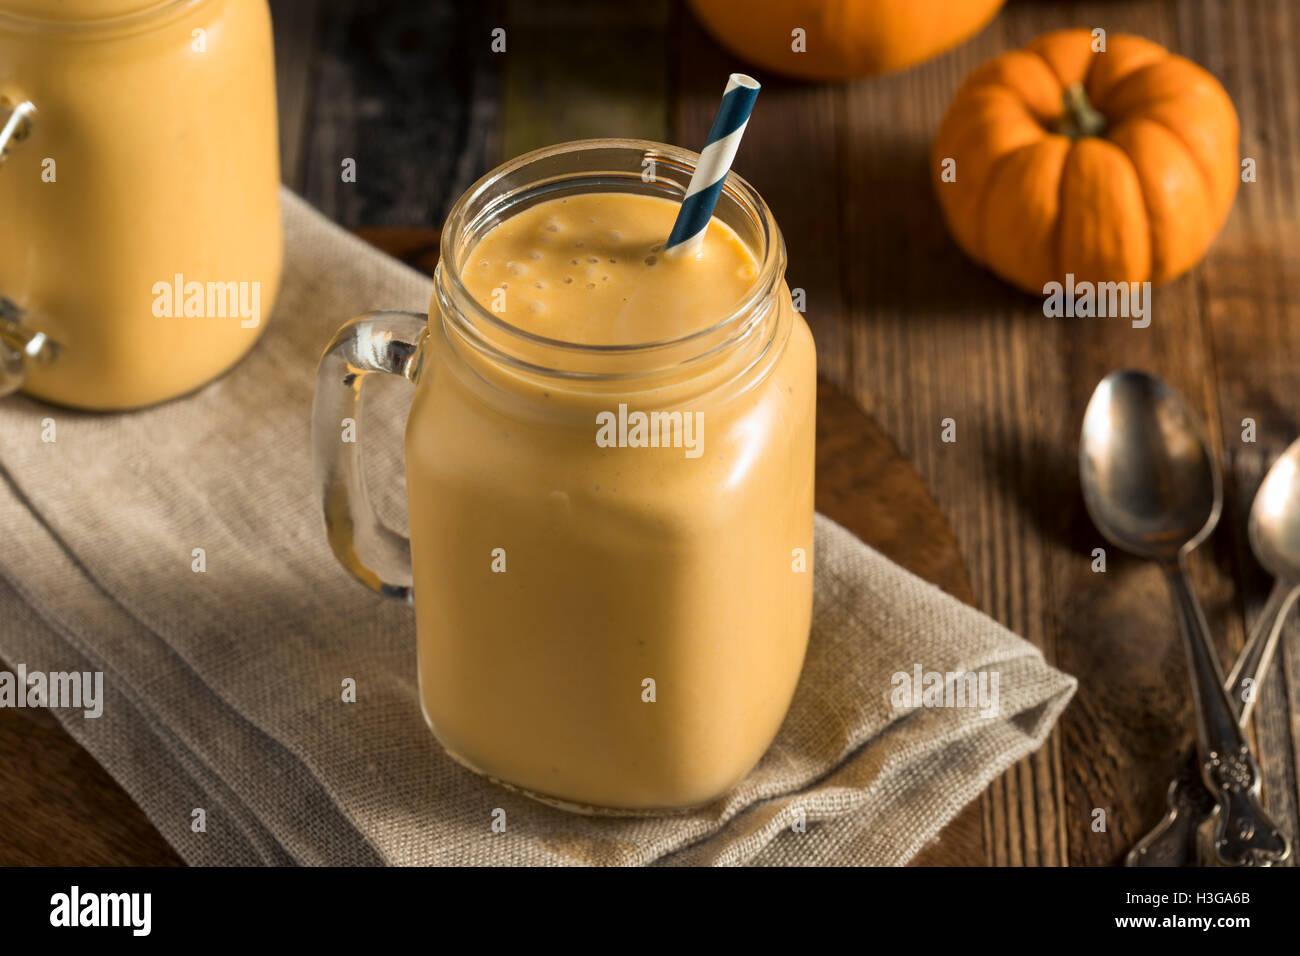 Healhty Organic Pumpkin Smoothie with Yogurt and Bananas - Stock Image